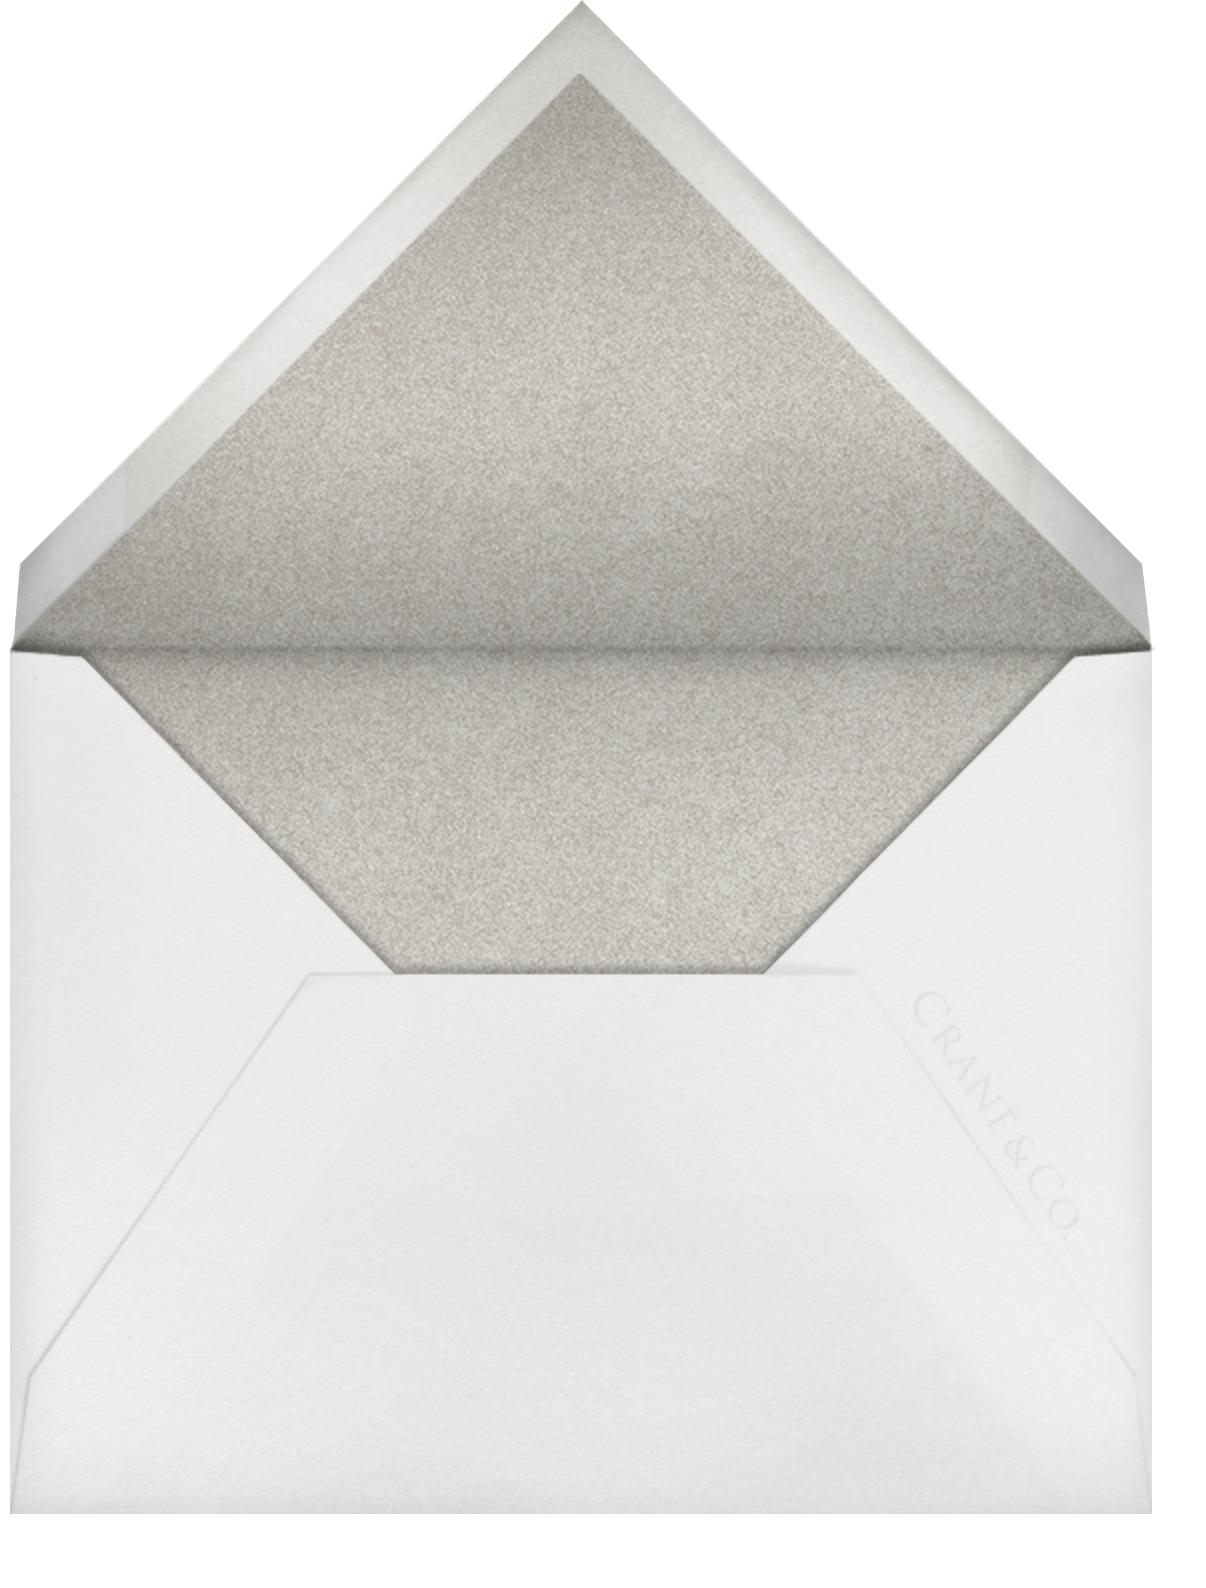 Tie the Knot - Platinum - Oscar de la Renta - null - envelope back